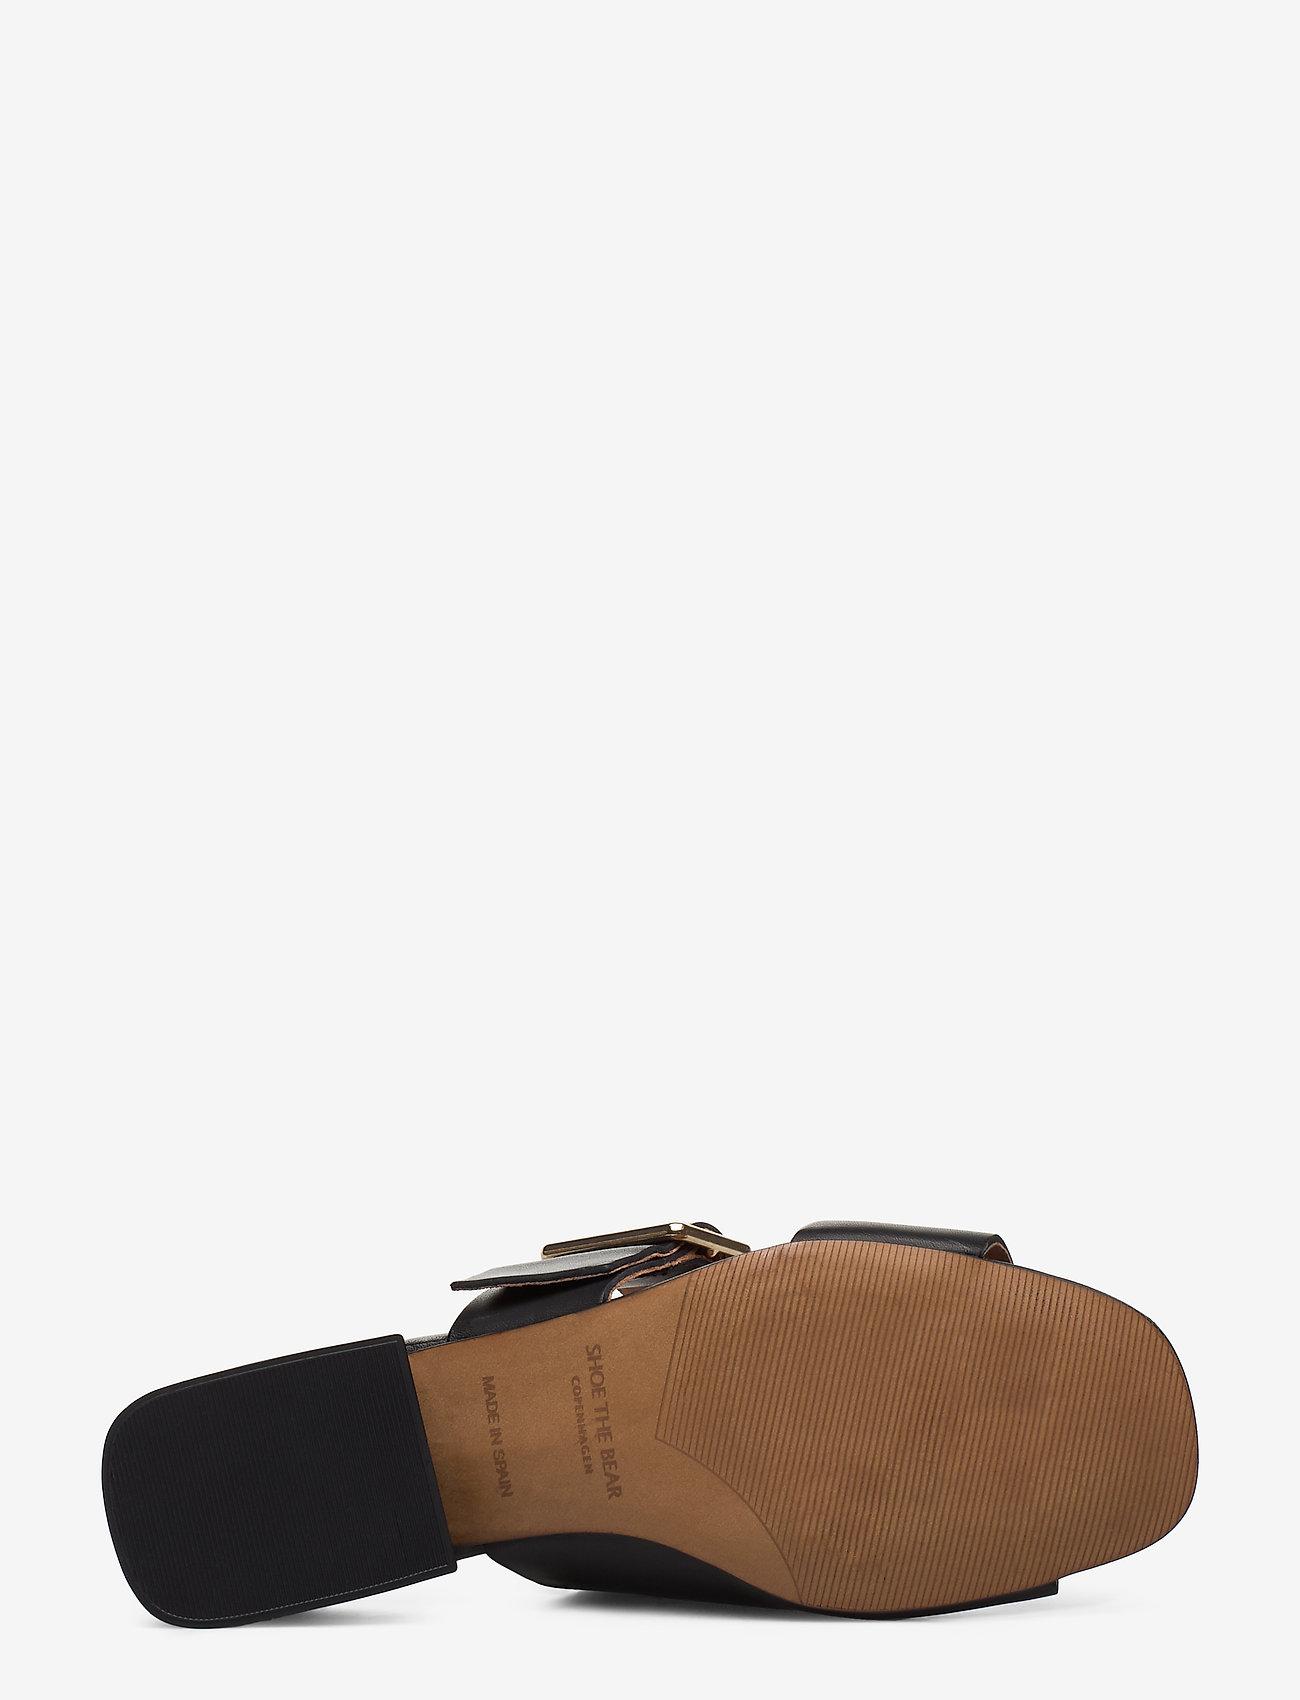 Stb-cala Buckle L (Black) (83.97 €) - Shoe The Bear pA2sg